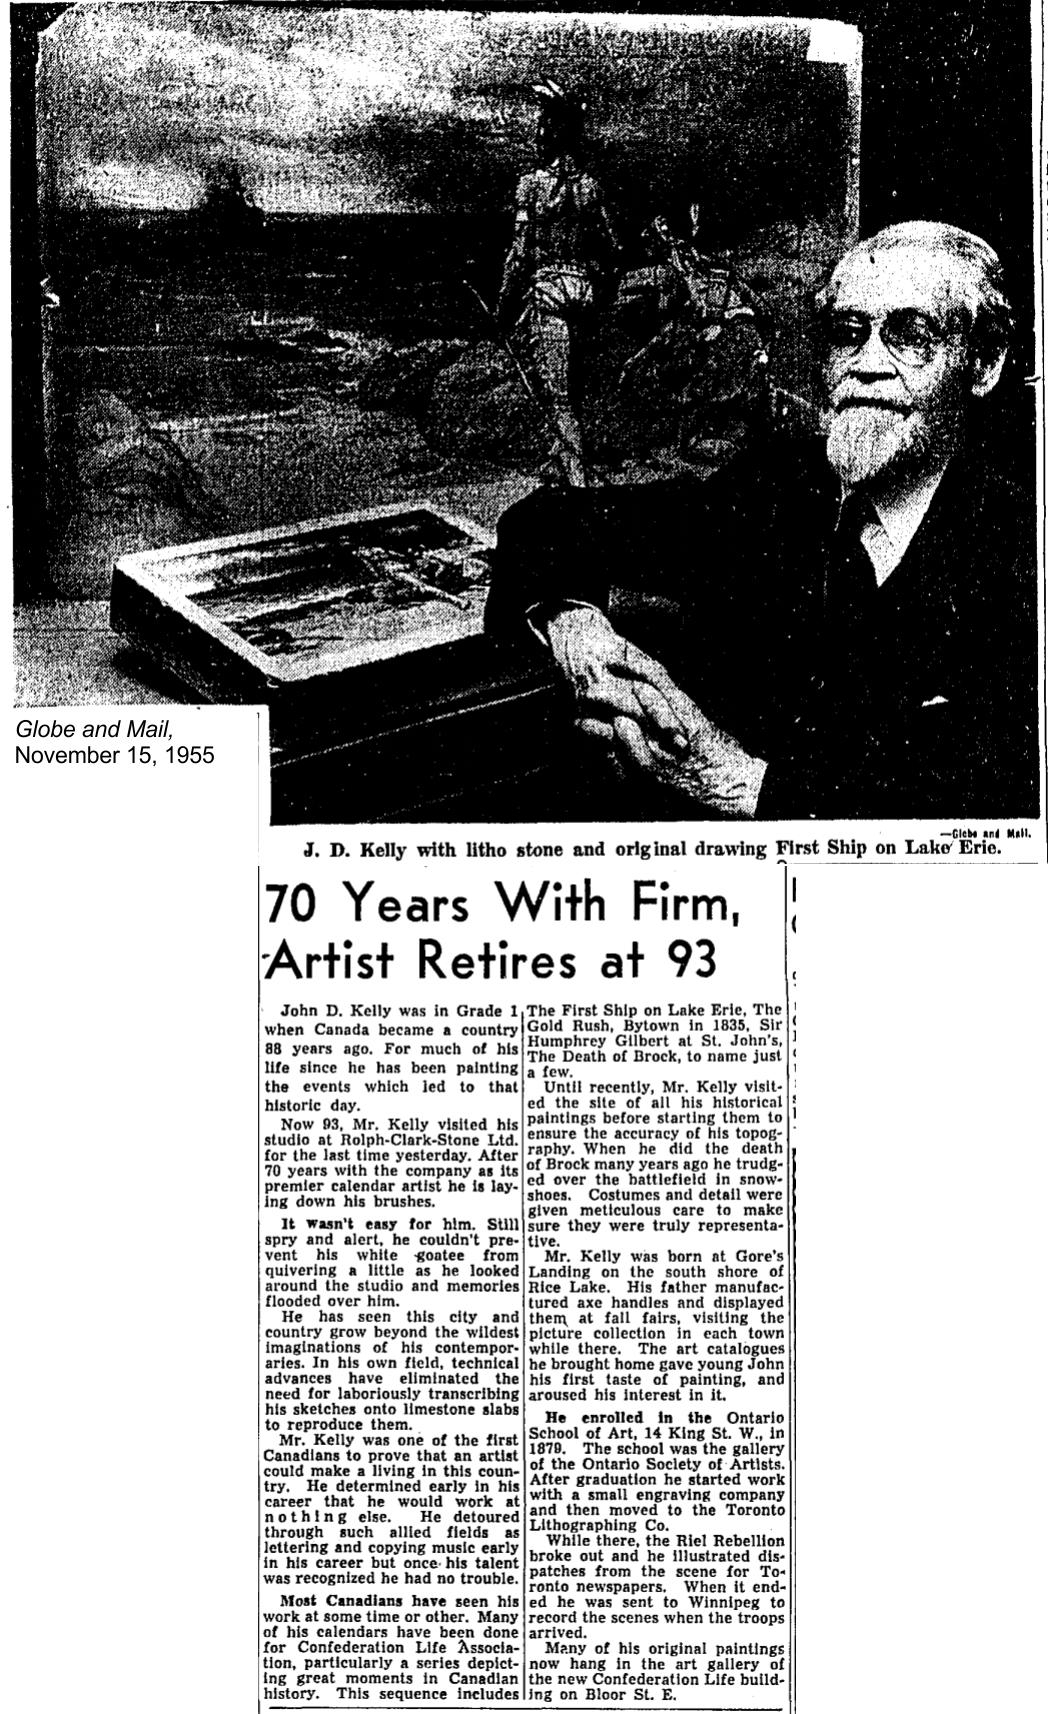 globe-and-mail-november-15-1955-j-d-kelly